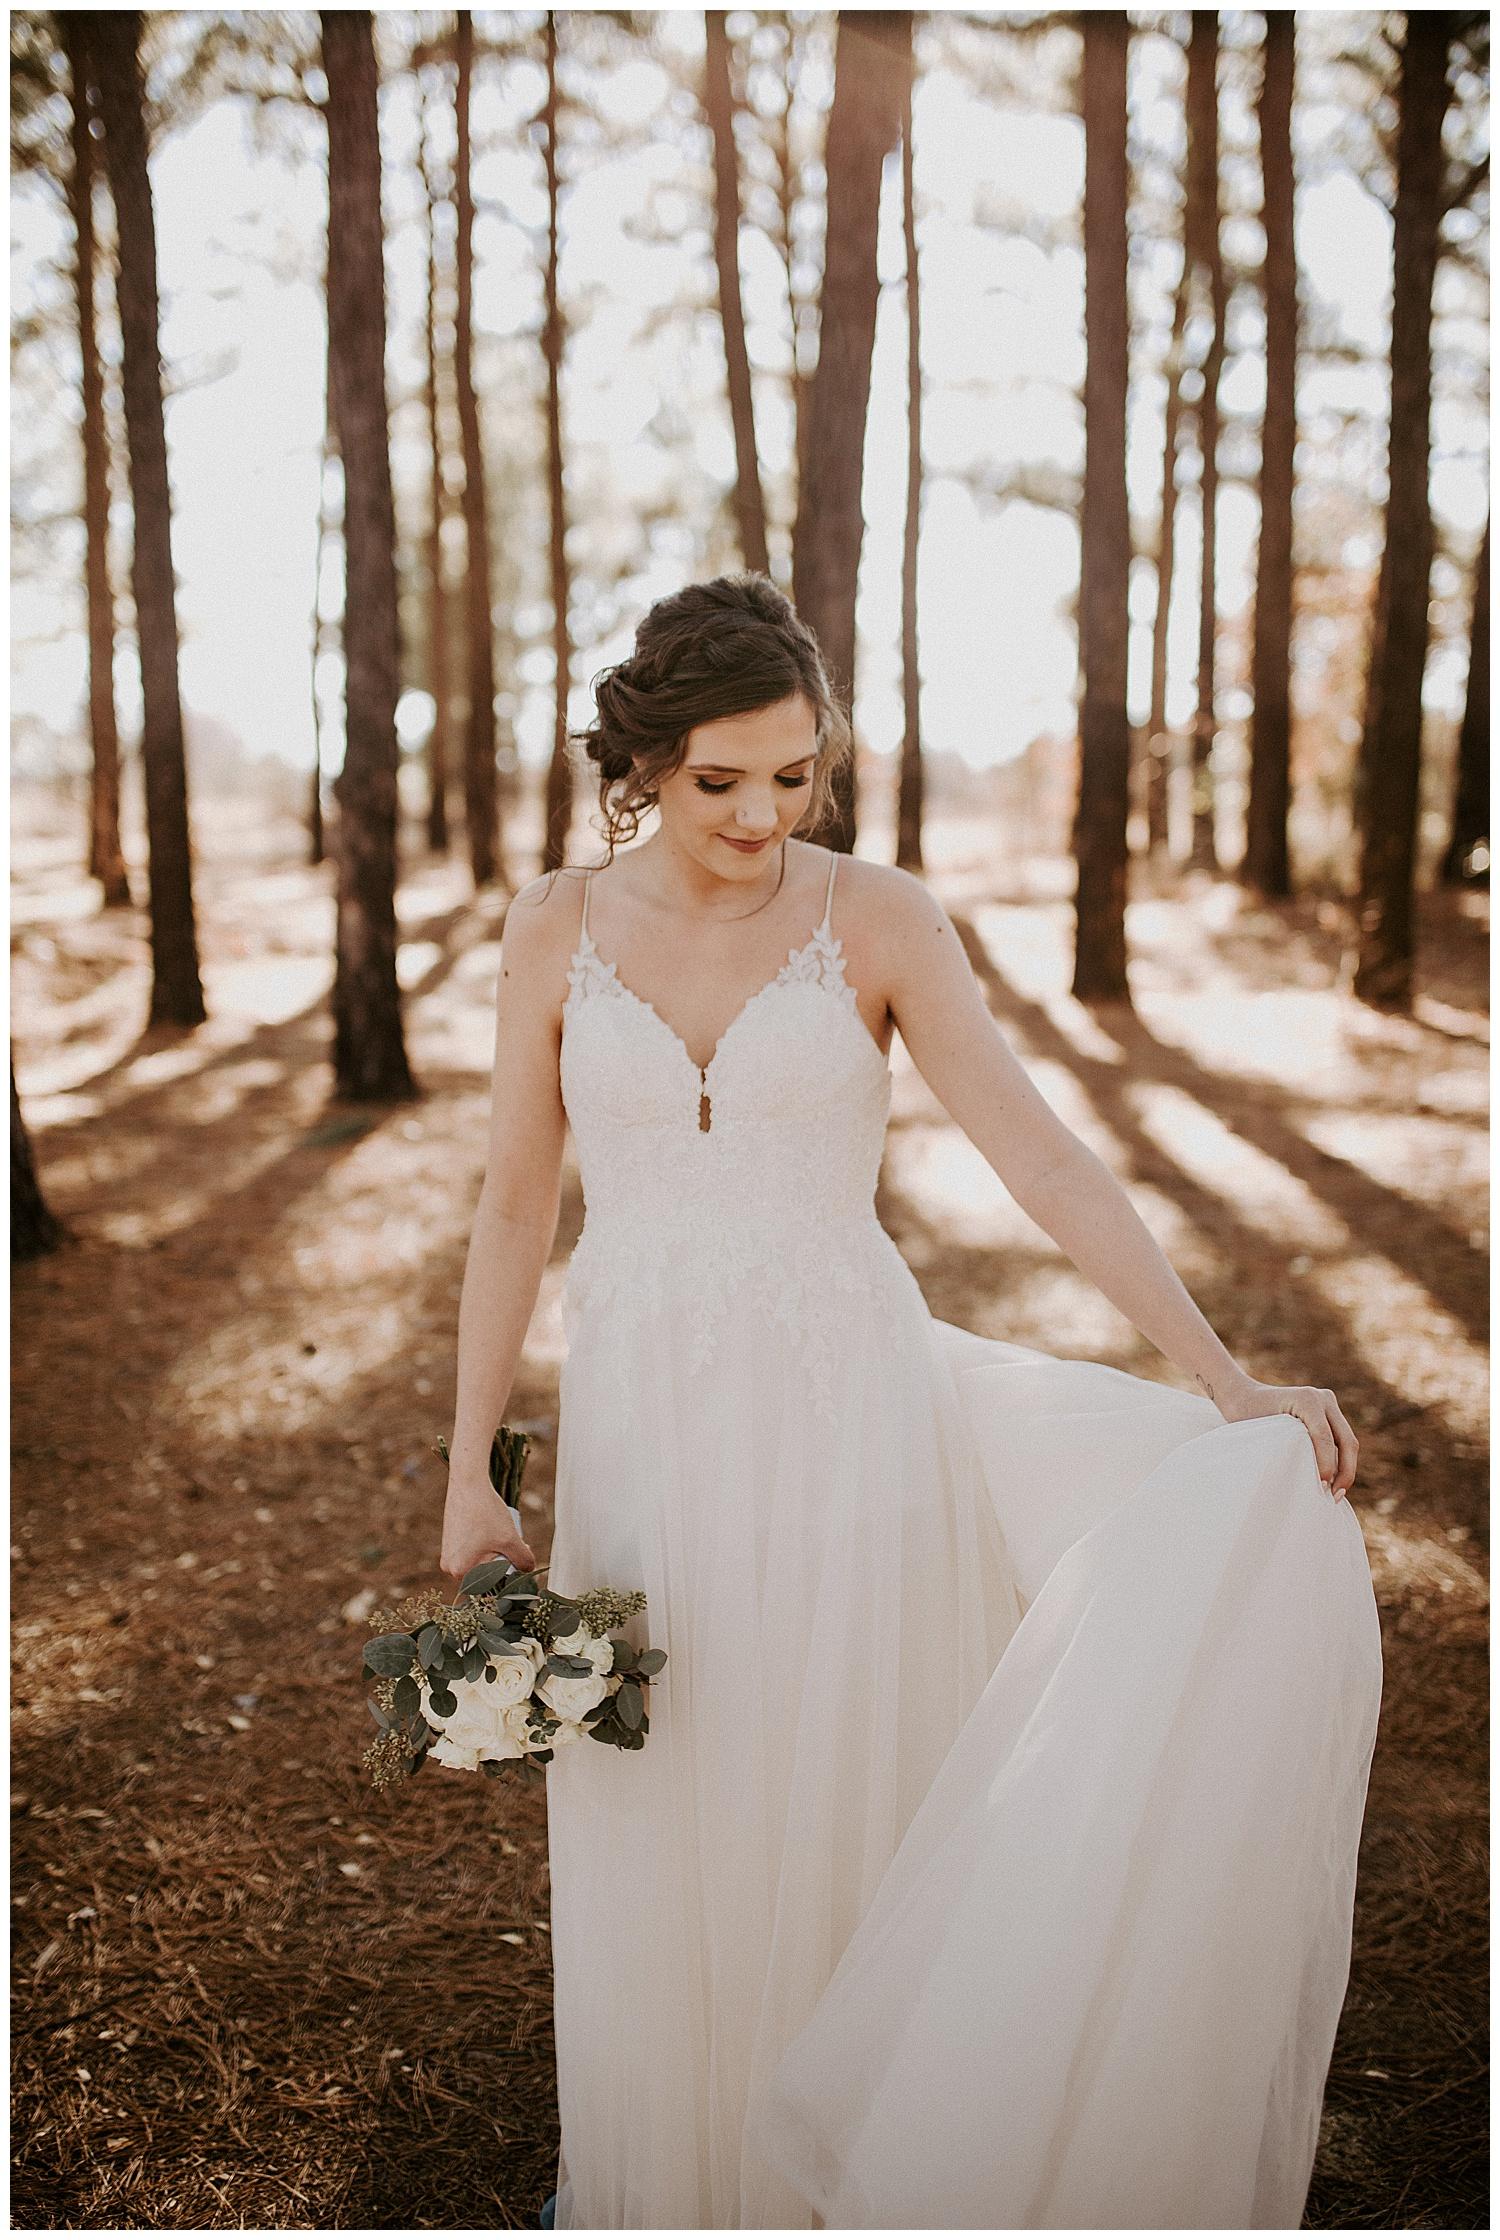 Laken-Mackenzie-Photography-Cheyenne-Bridal-Session-Dallas-Fort-Worth-Wedding-Photographer04.jpg